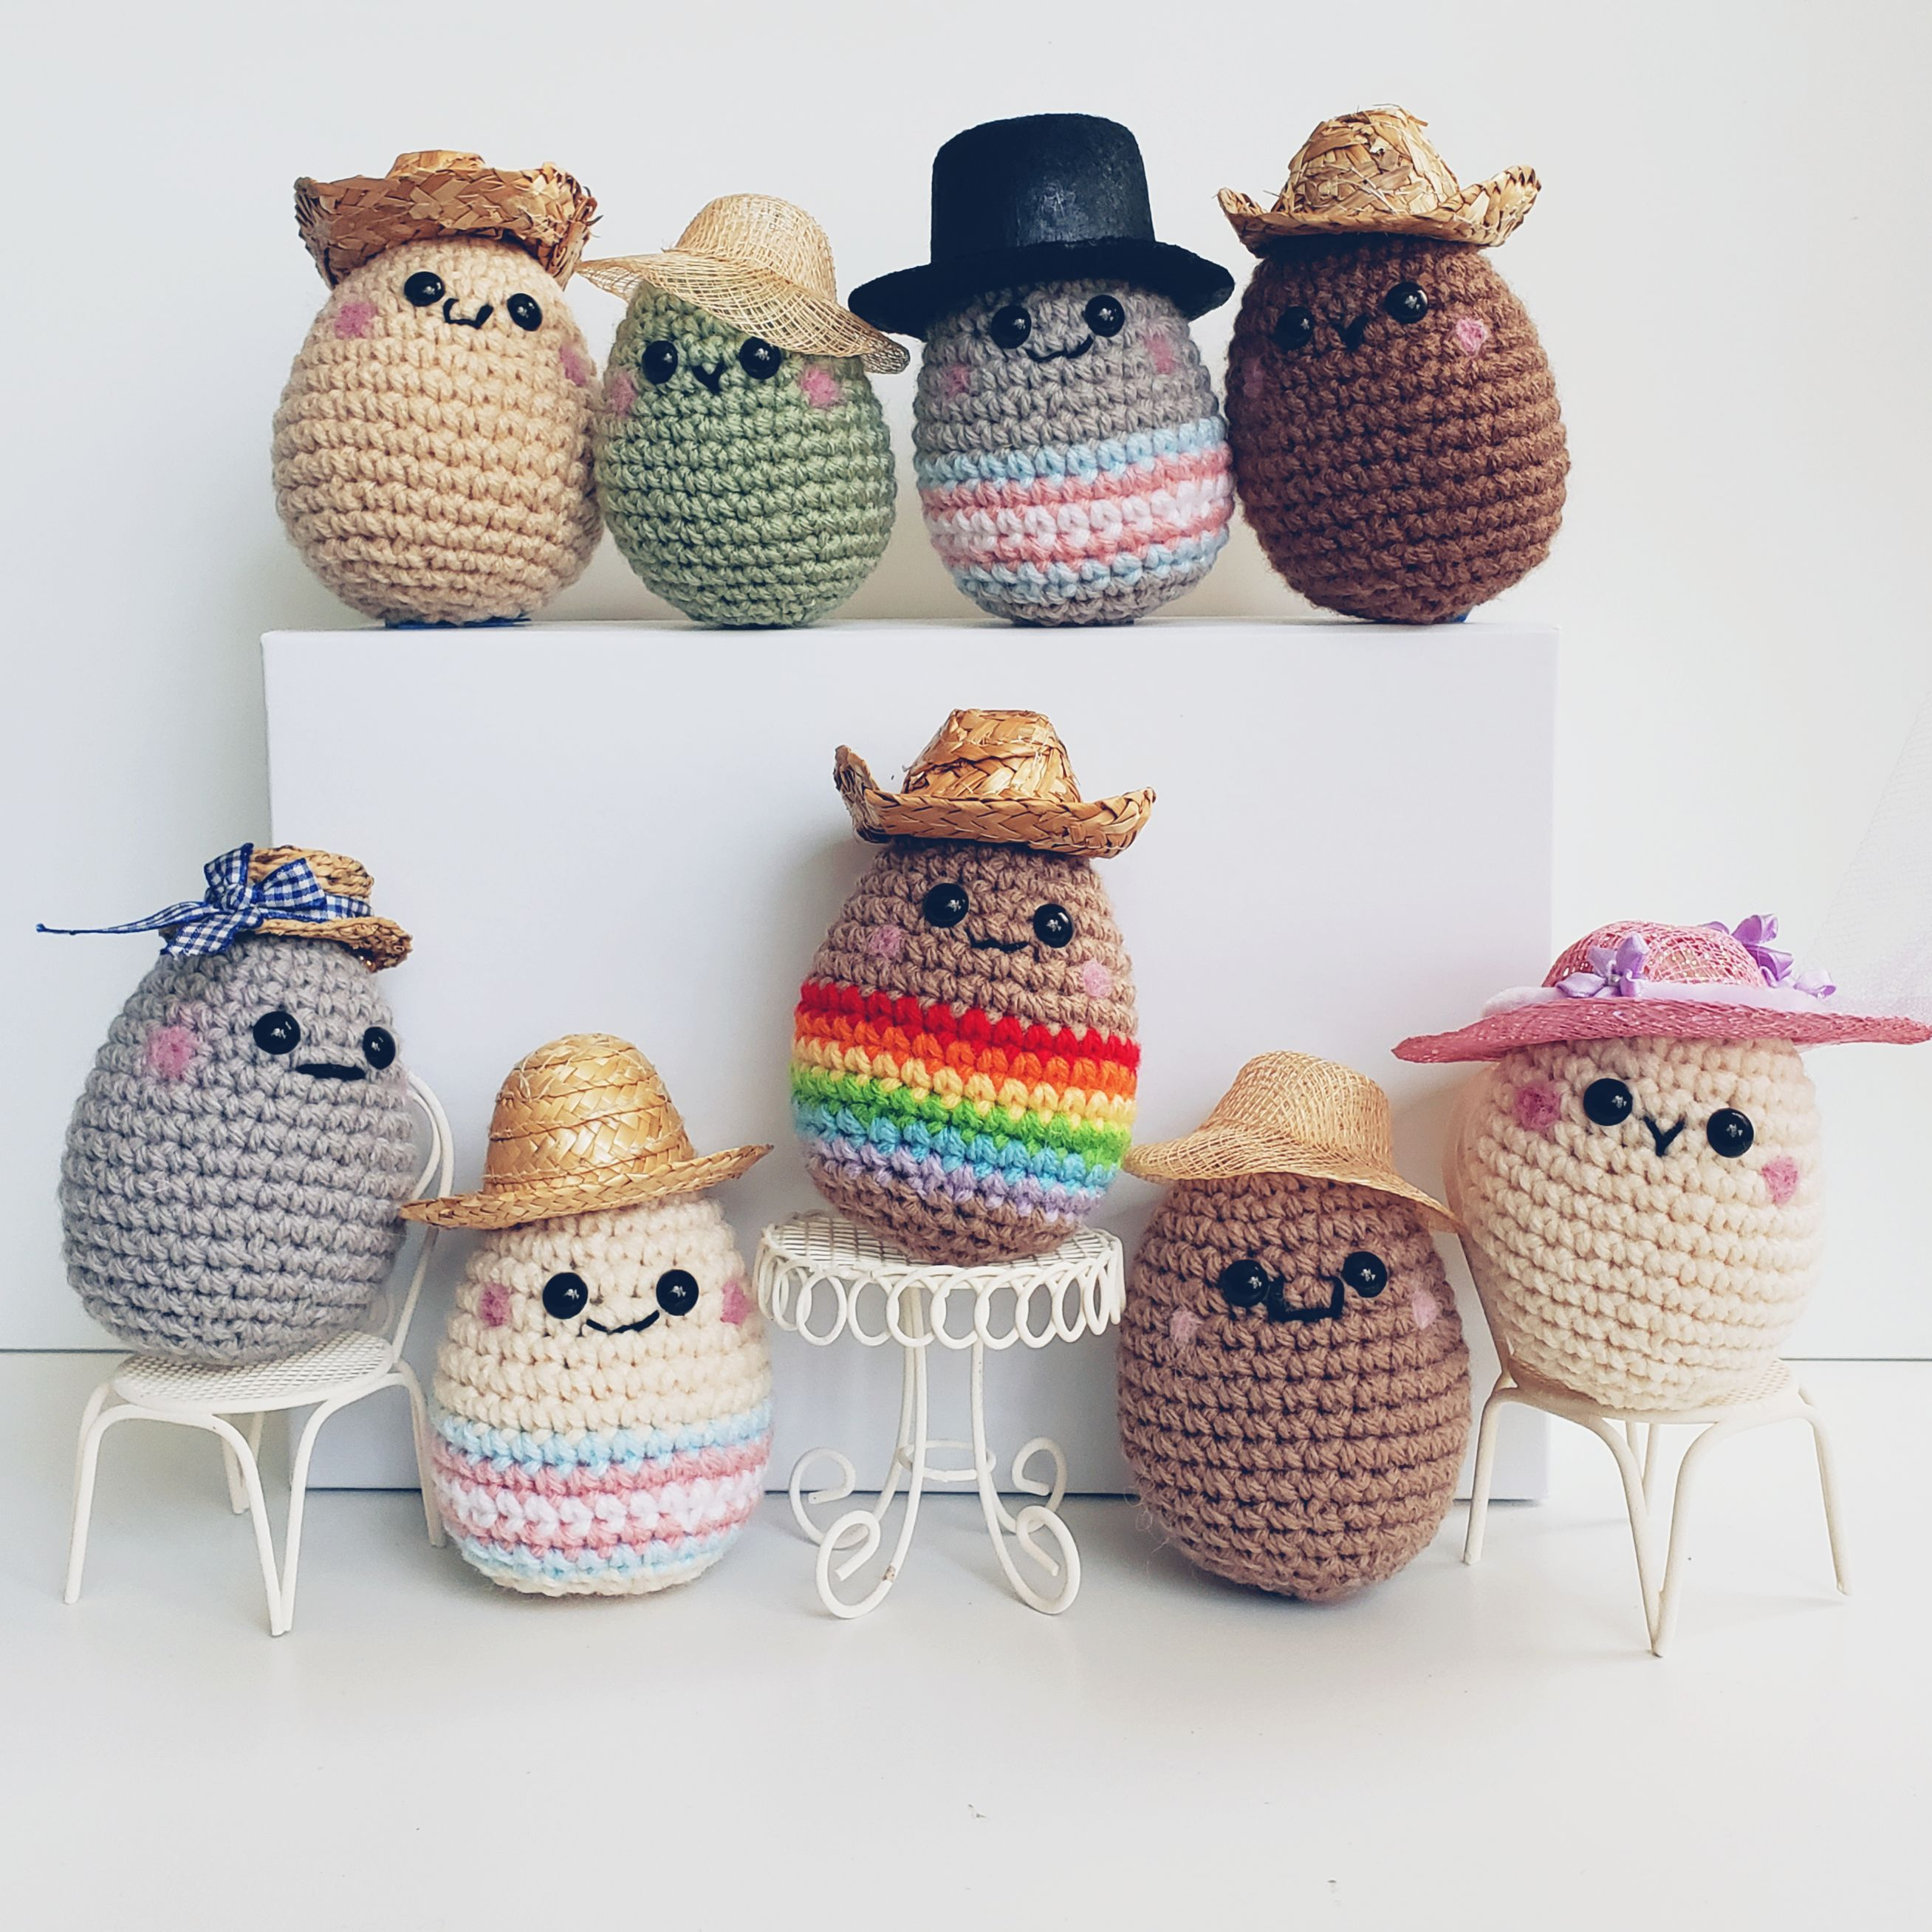 How to read amigurumi crochet patterns ? – June Lee Hooker | 2616x2616